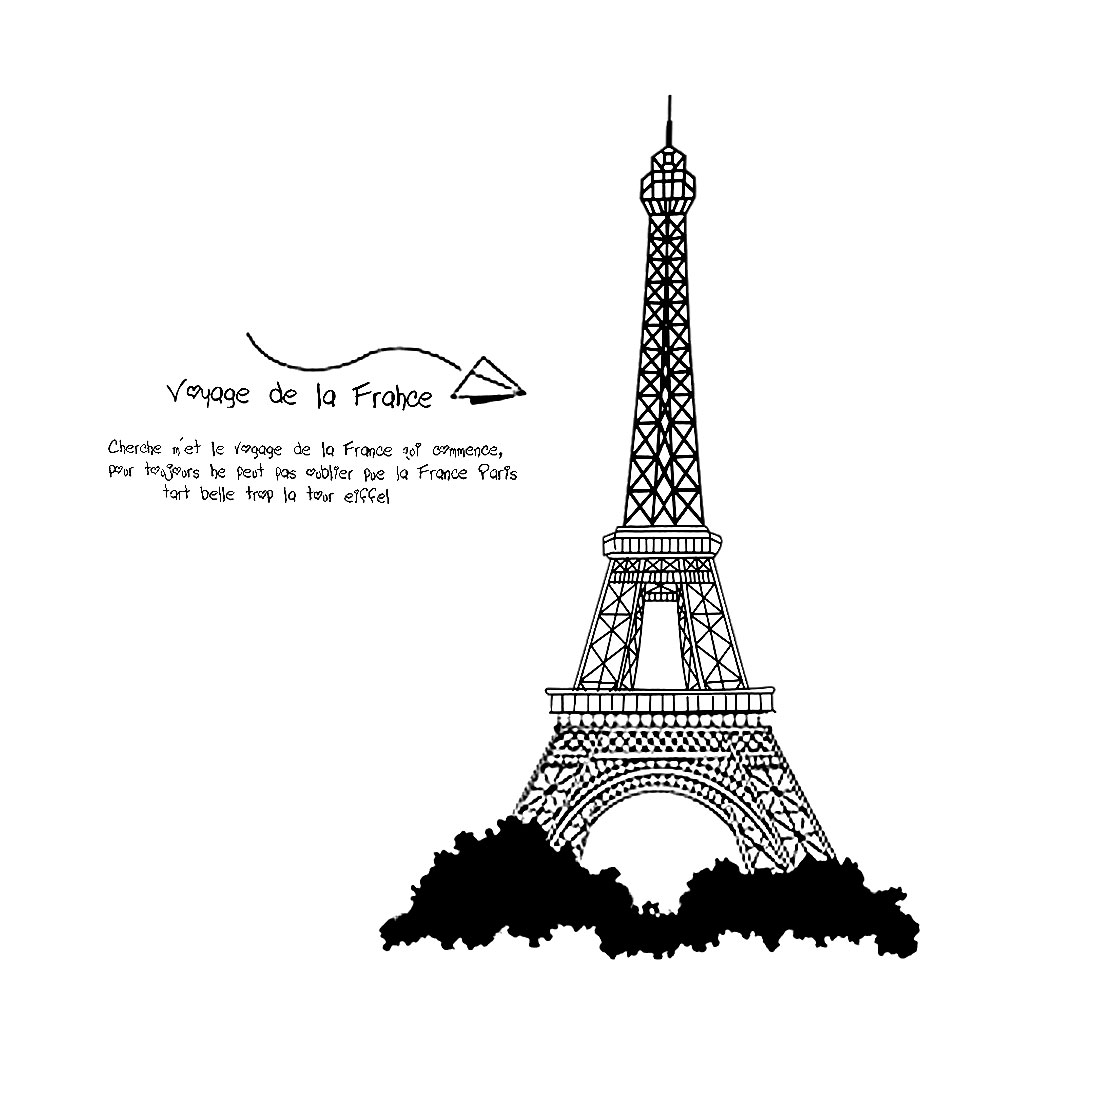 Unique Bargains Bedroom Decor Adhesive DIY Eiffel Tower Letters Wall Sticker 100cm x 90cm Black